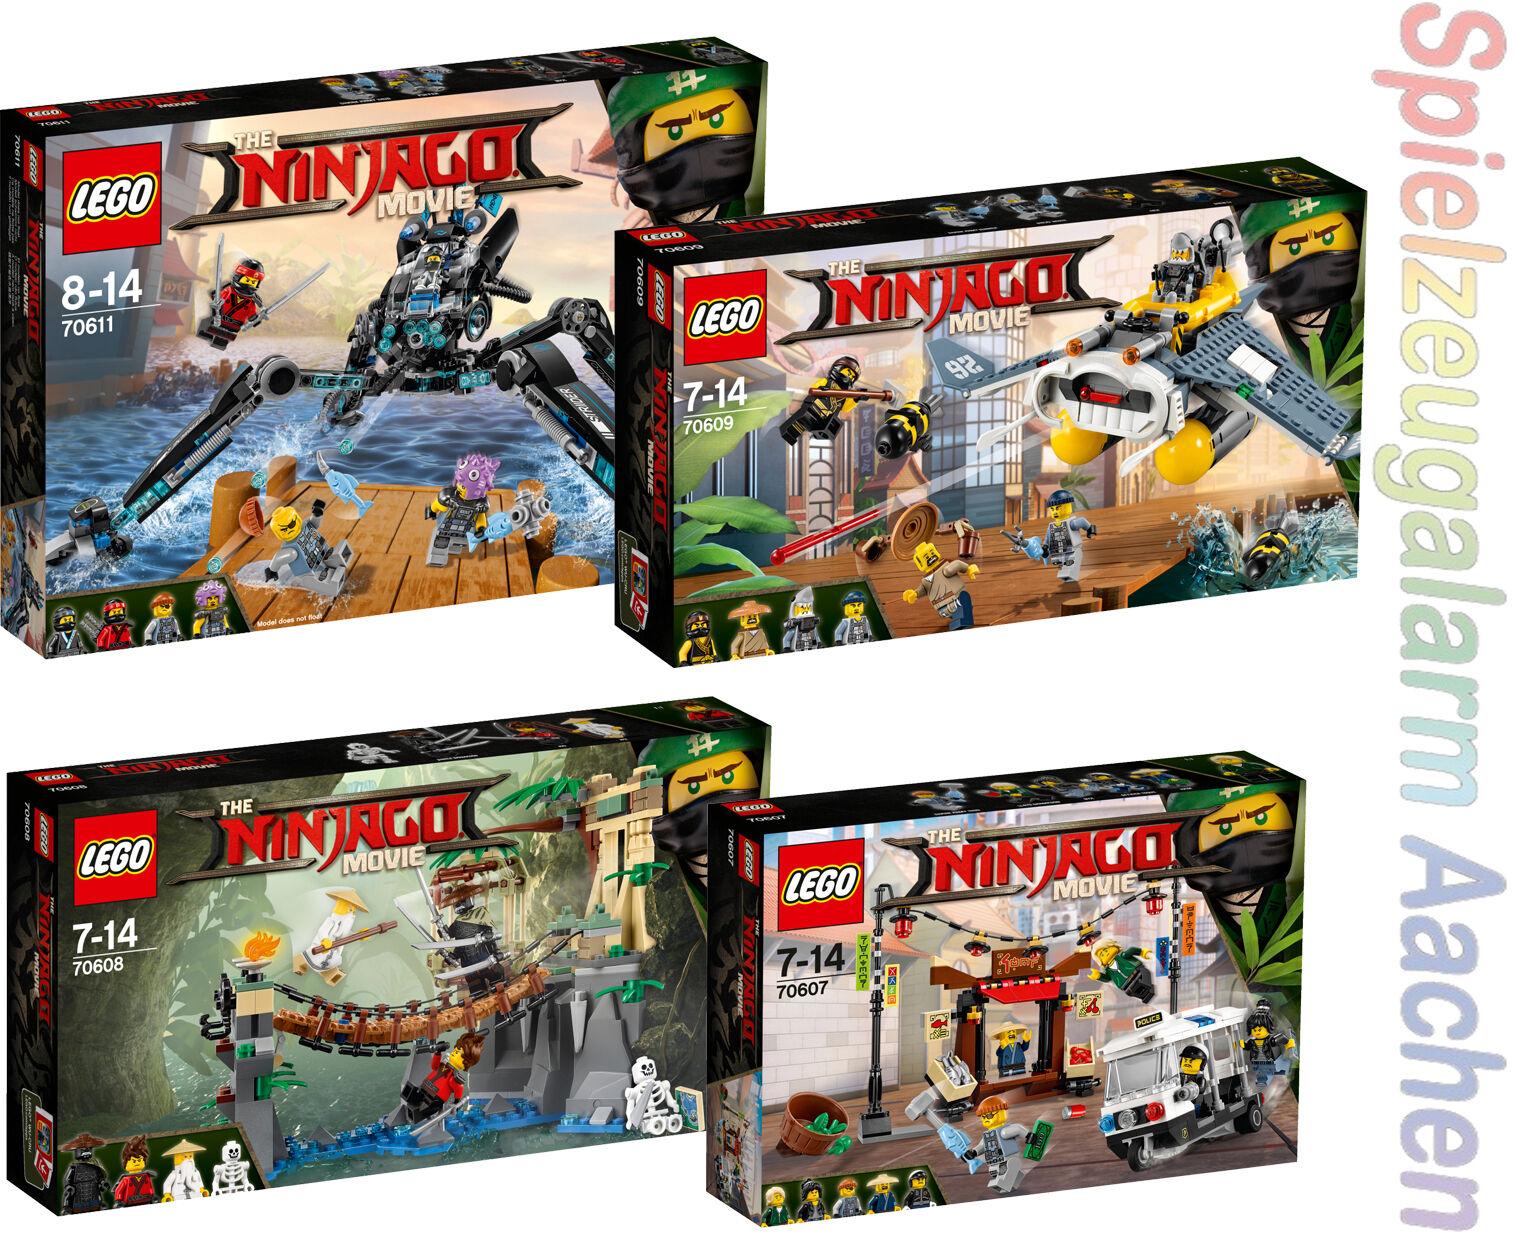 LEGO NINJAGO value SET 70607+70608+70609+70611 N8/17